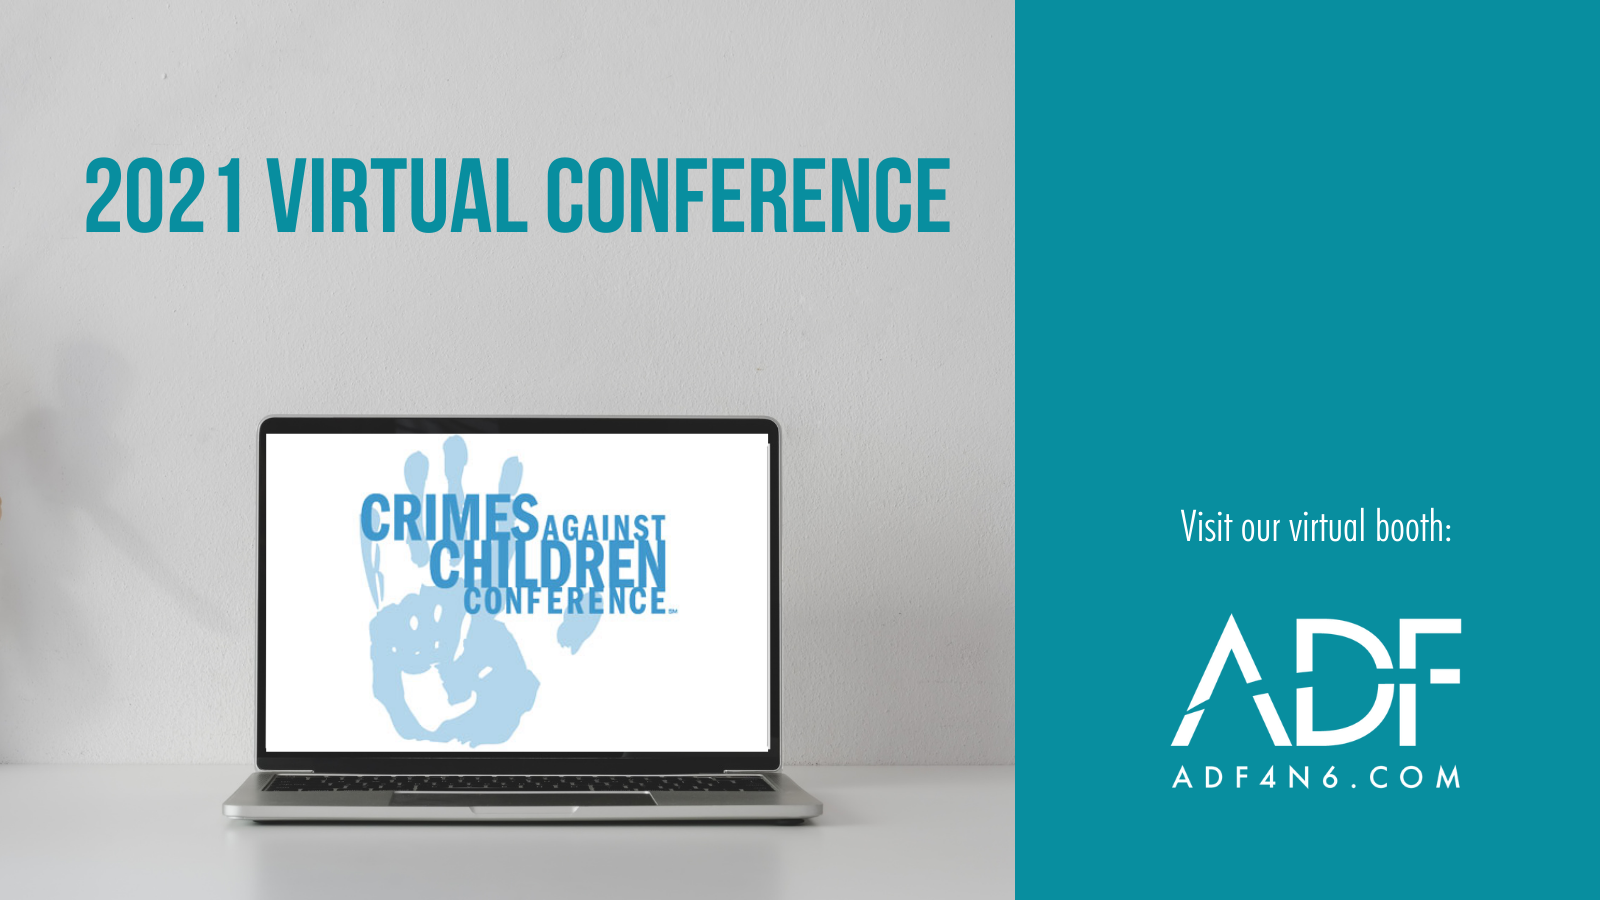 Crimes Against Children Conference 2021